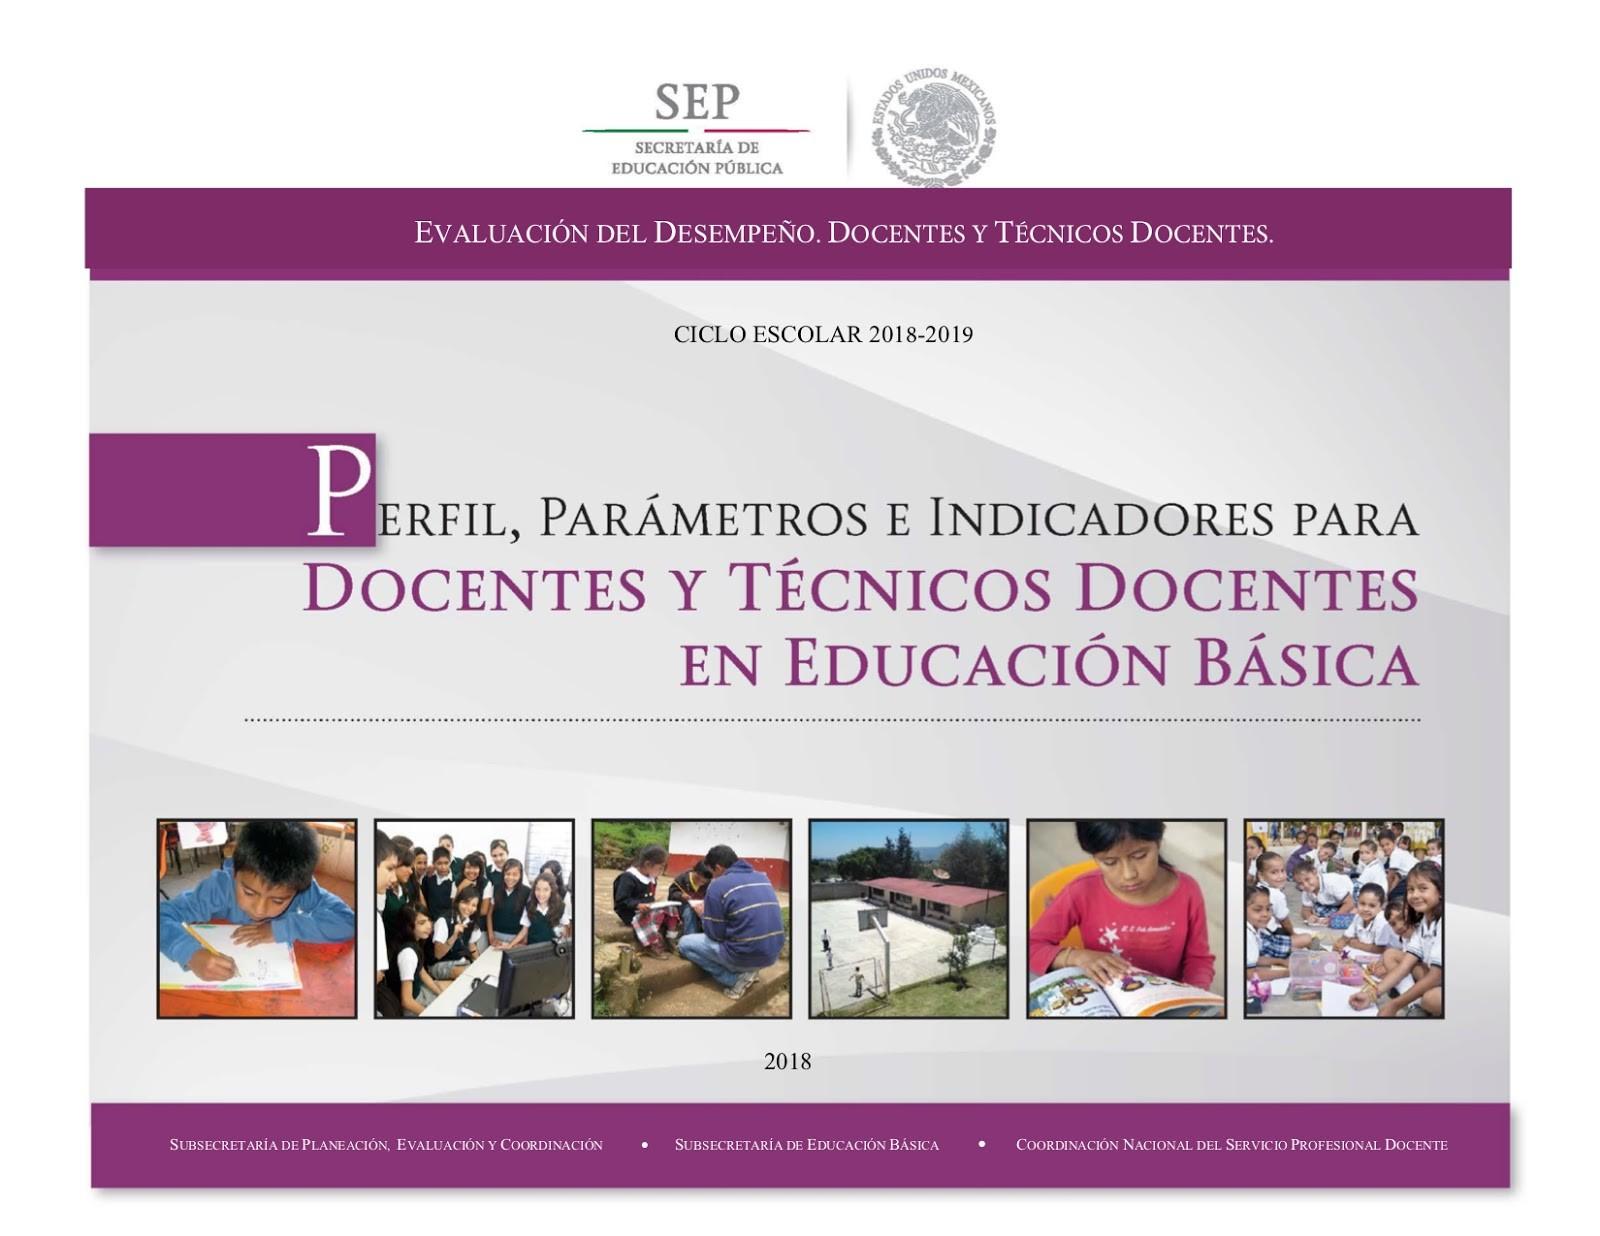 Parámetros e Indicadores para Docentes y Técnicos Docentes Evaluaci³n del Desempe±o Docentes y Técnicos Docentes Ciclo Escolar 2018 2019